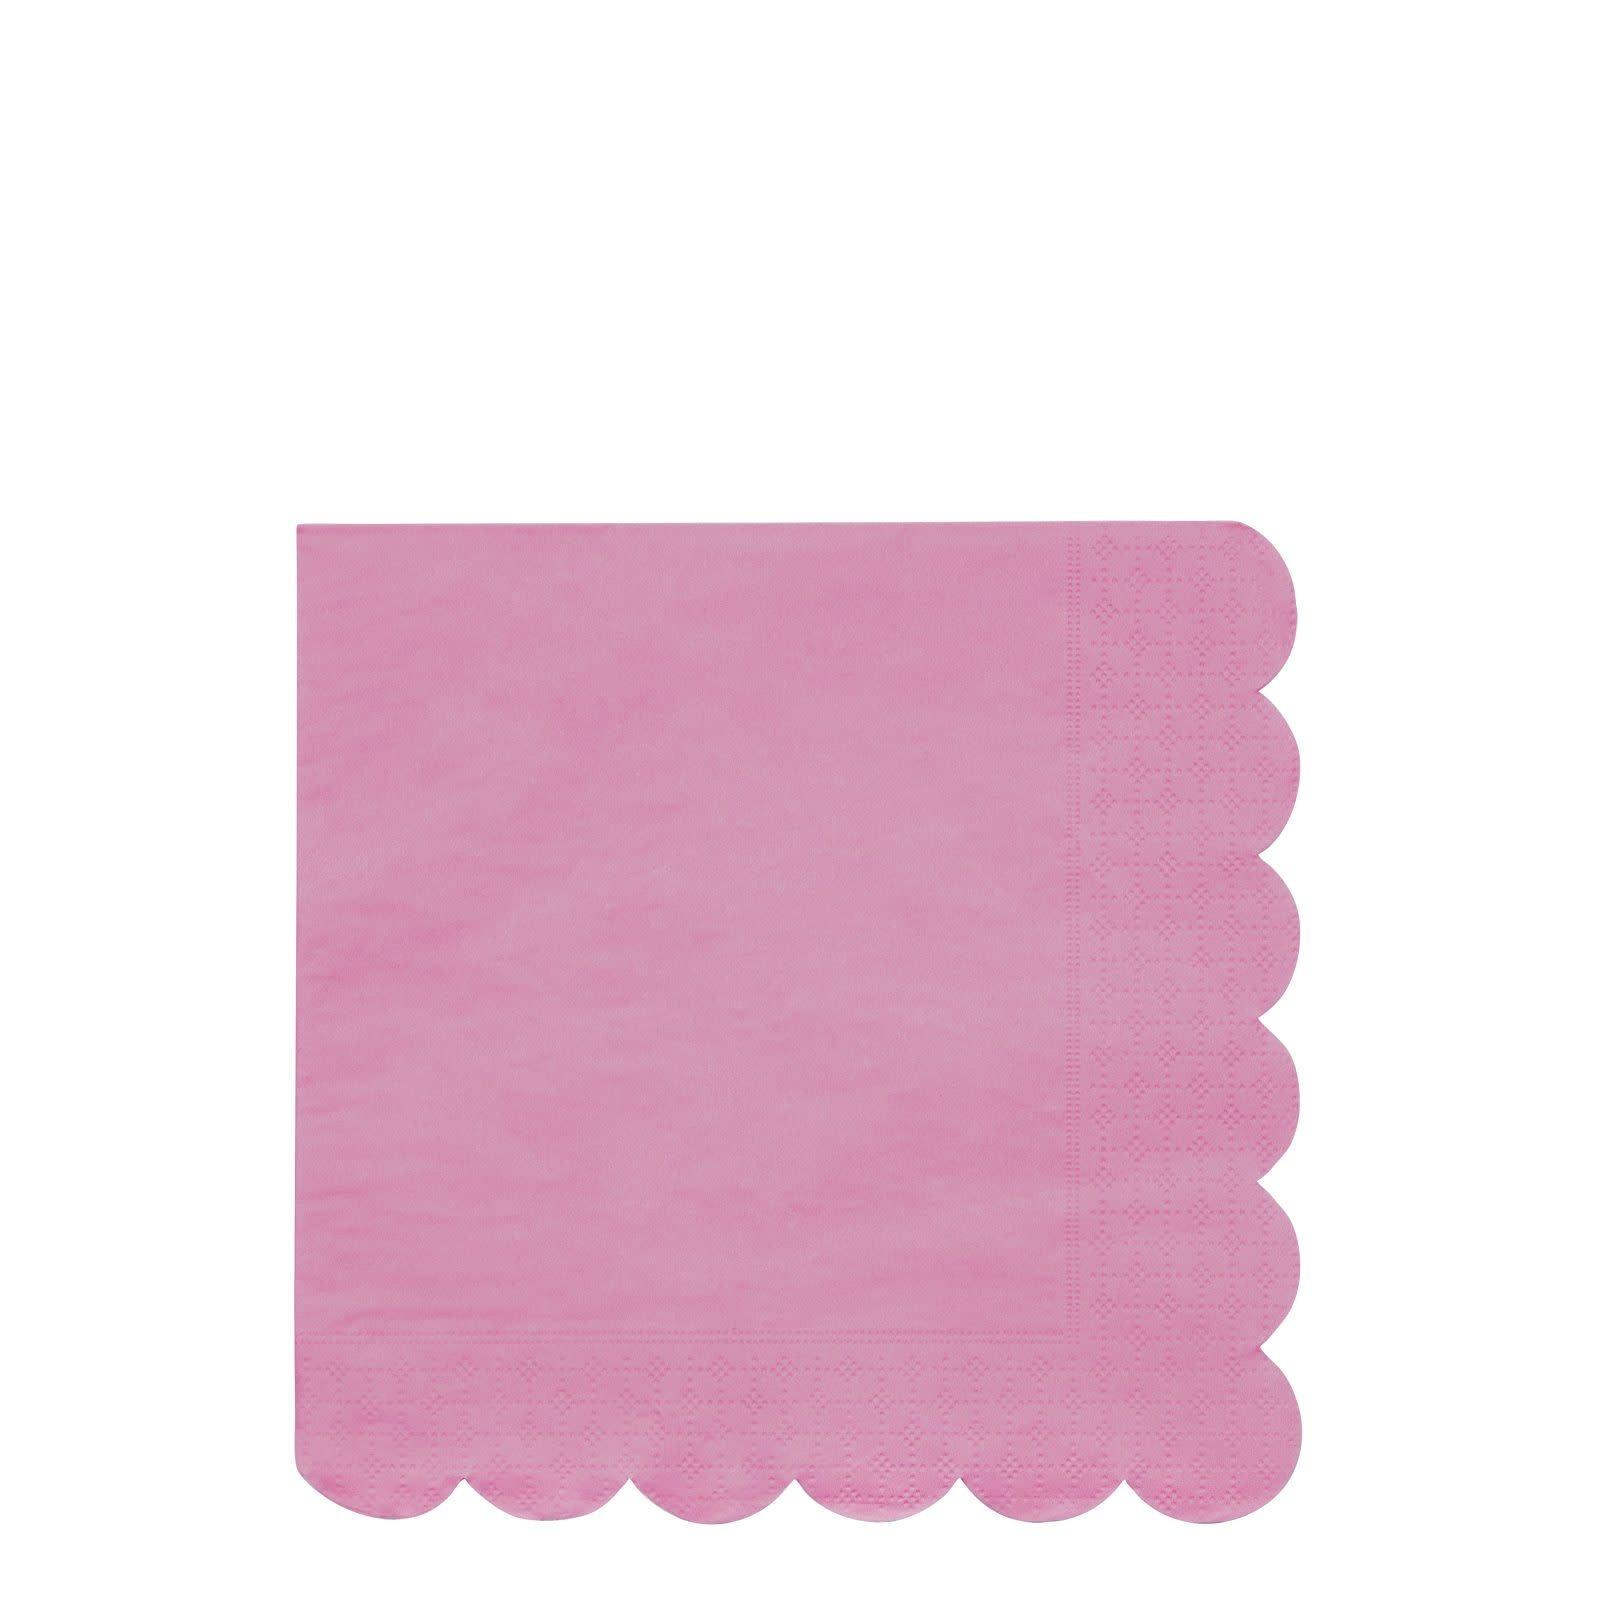 MERIMERI Deep pink simply eco napkins L